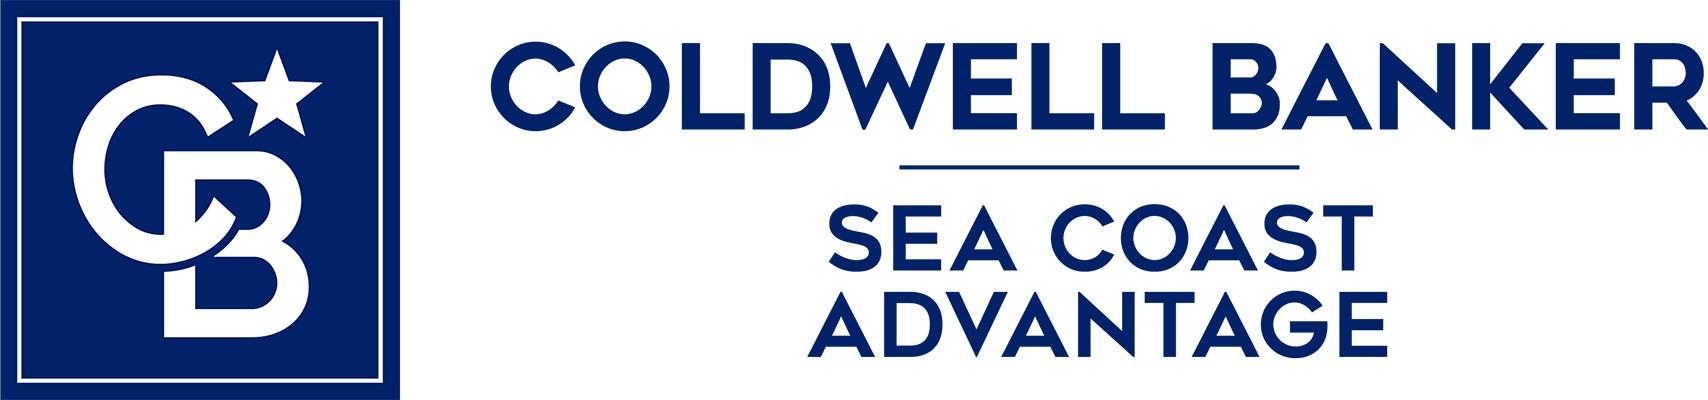 Stephanie Putnam - Coldwell Banker Sea Coast Advantage Realty Logo